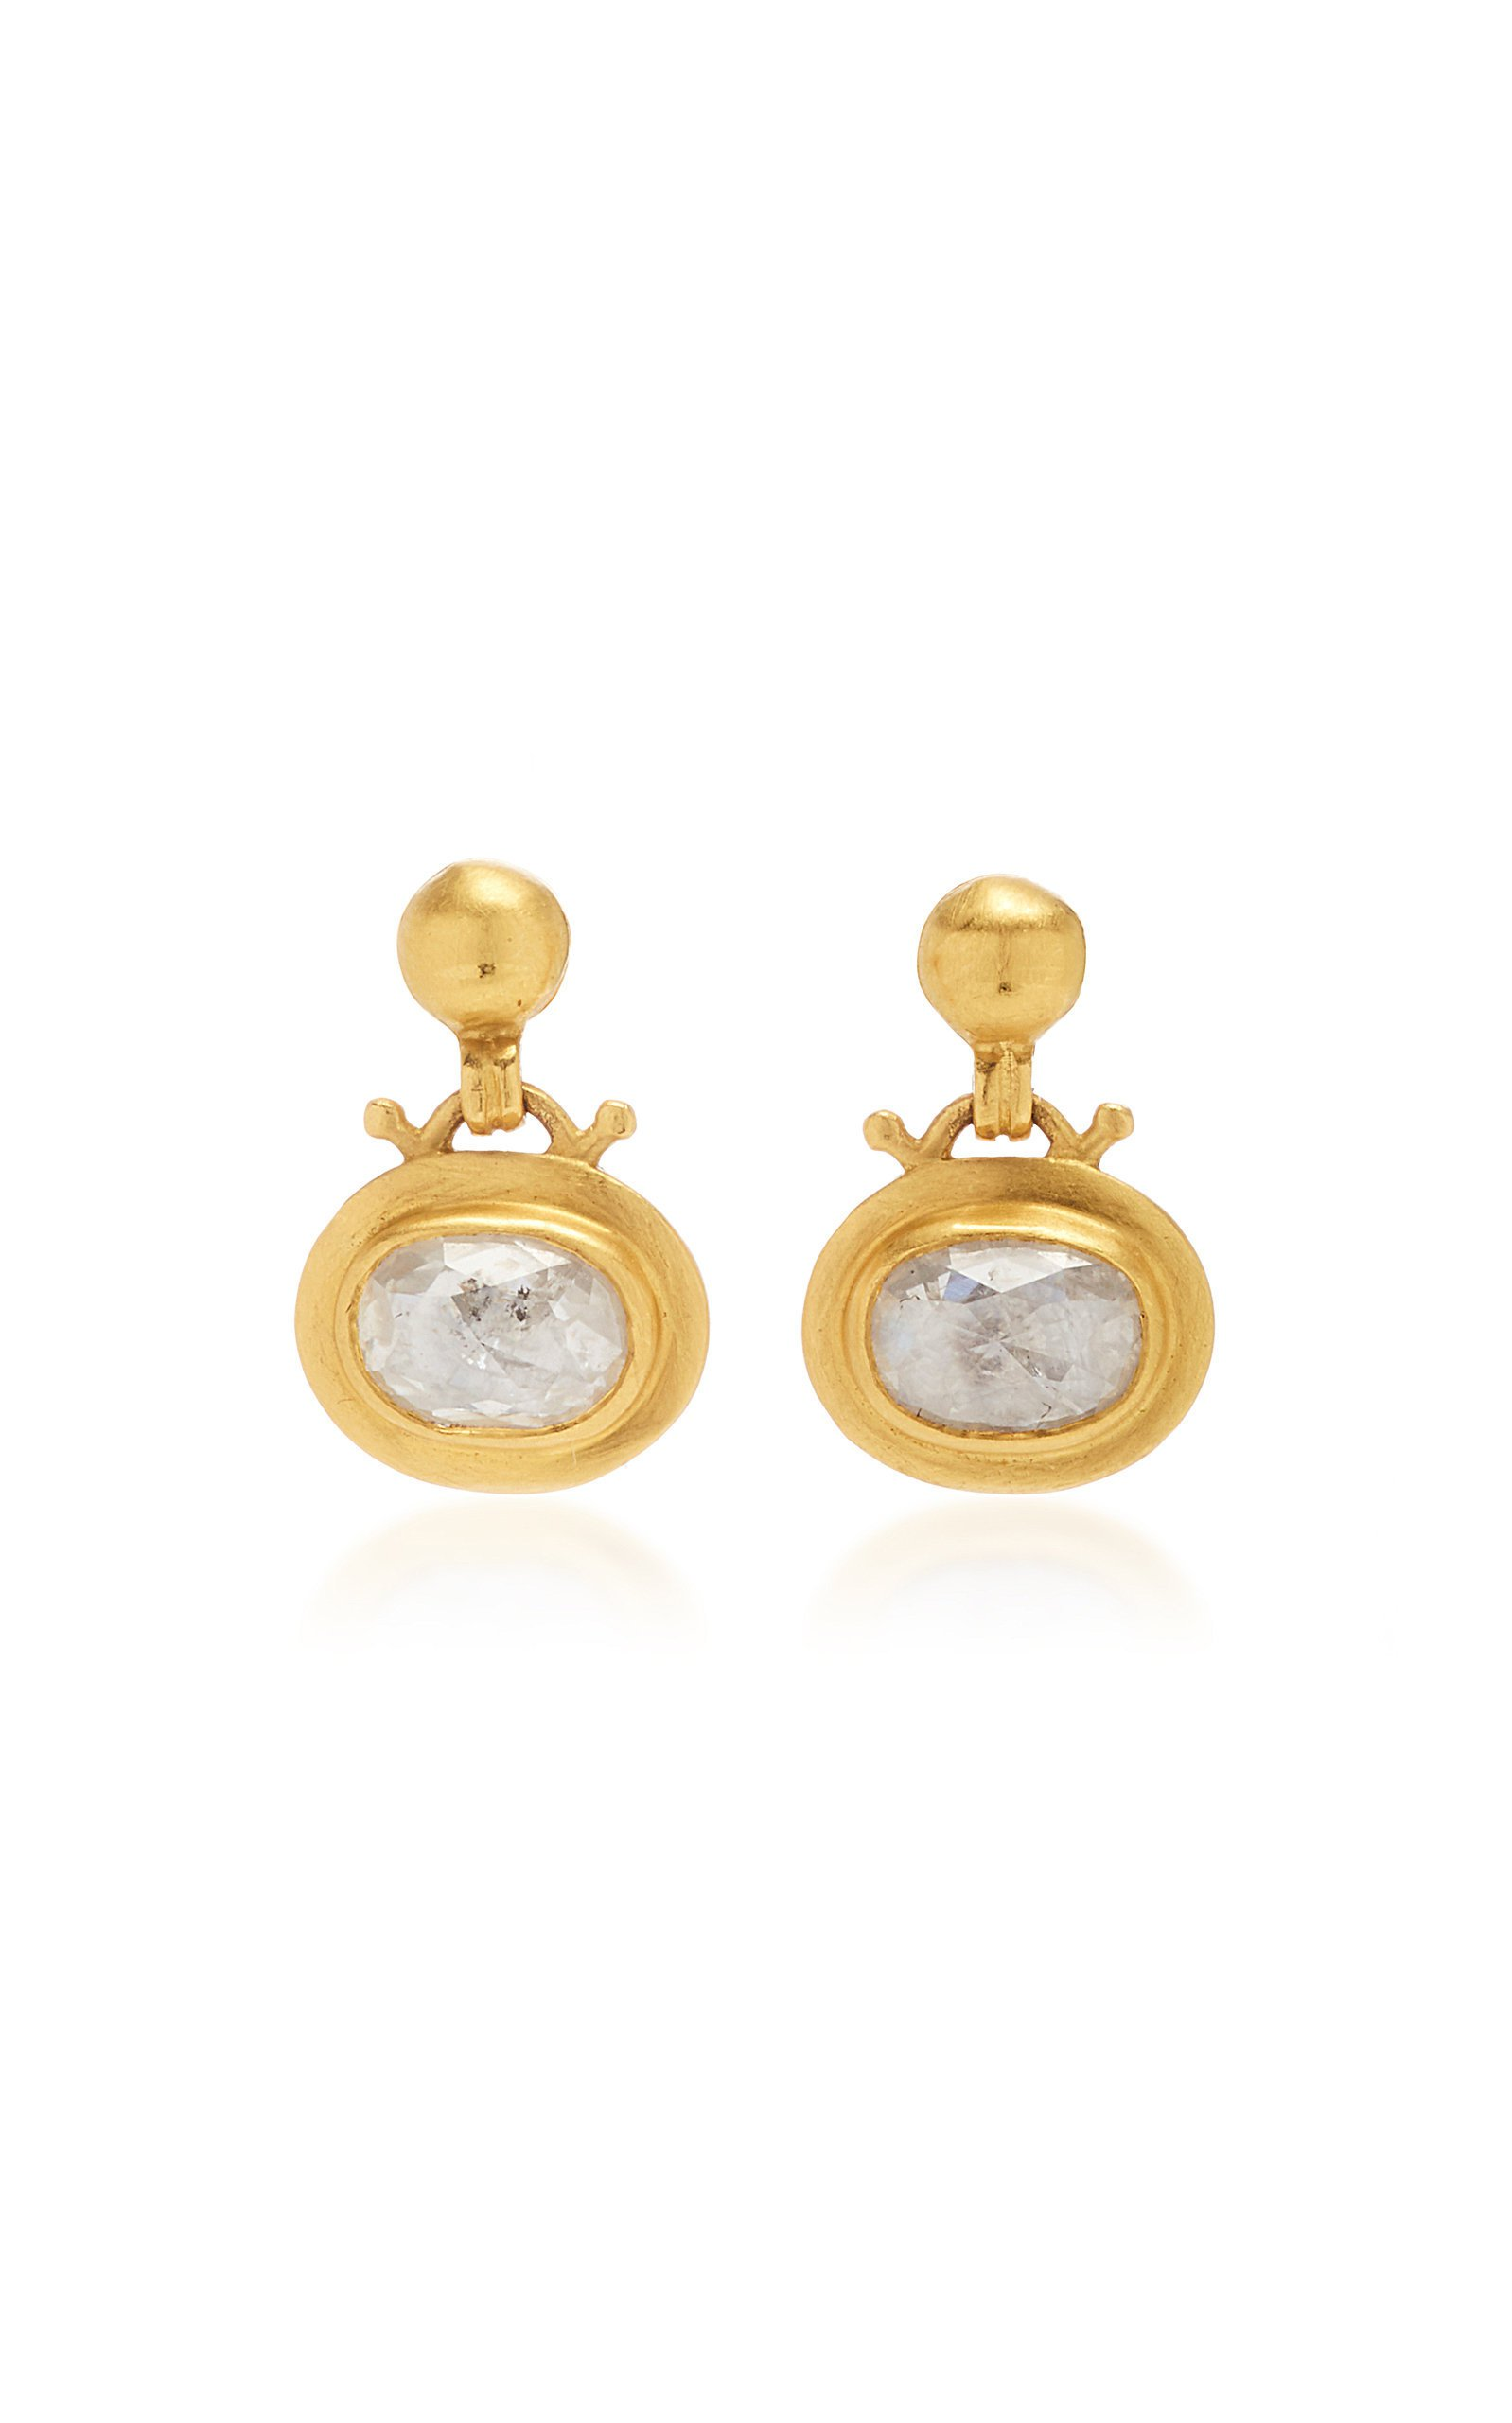 Prounis Small Diamond Bell Earrings